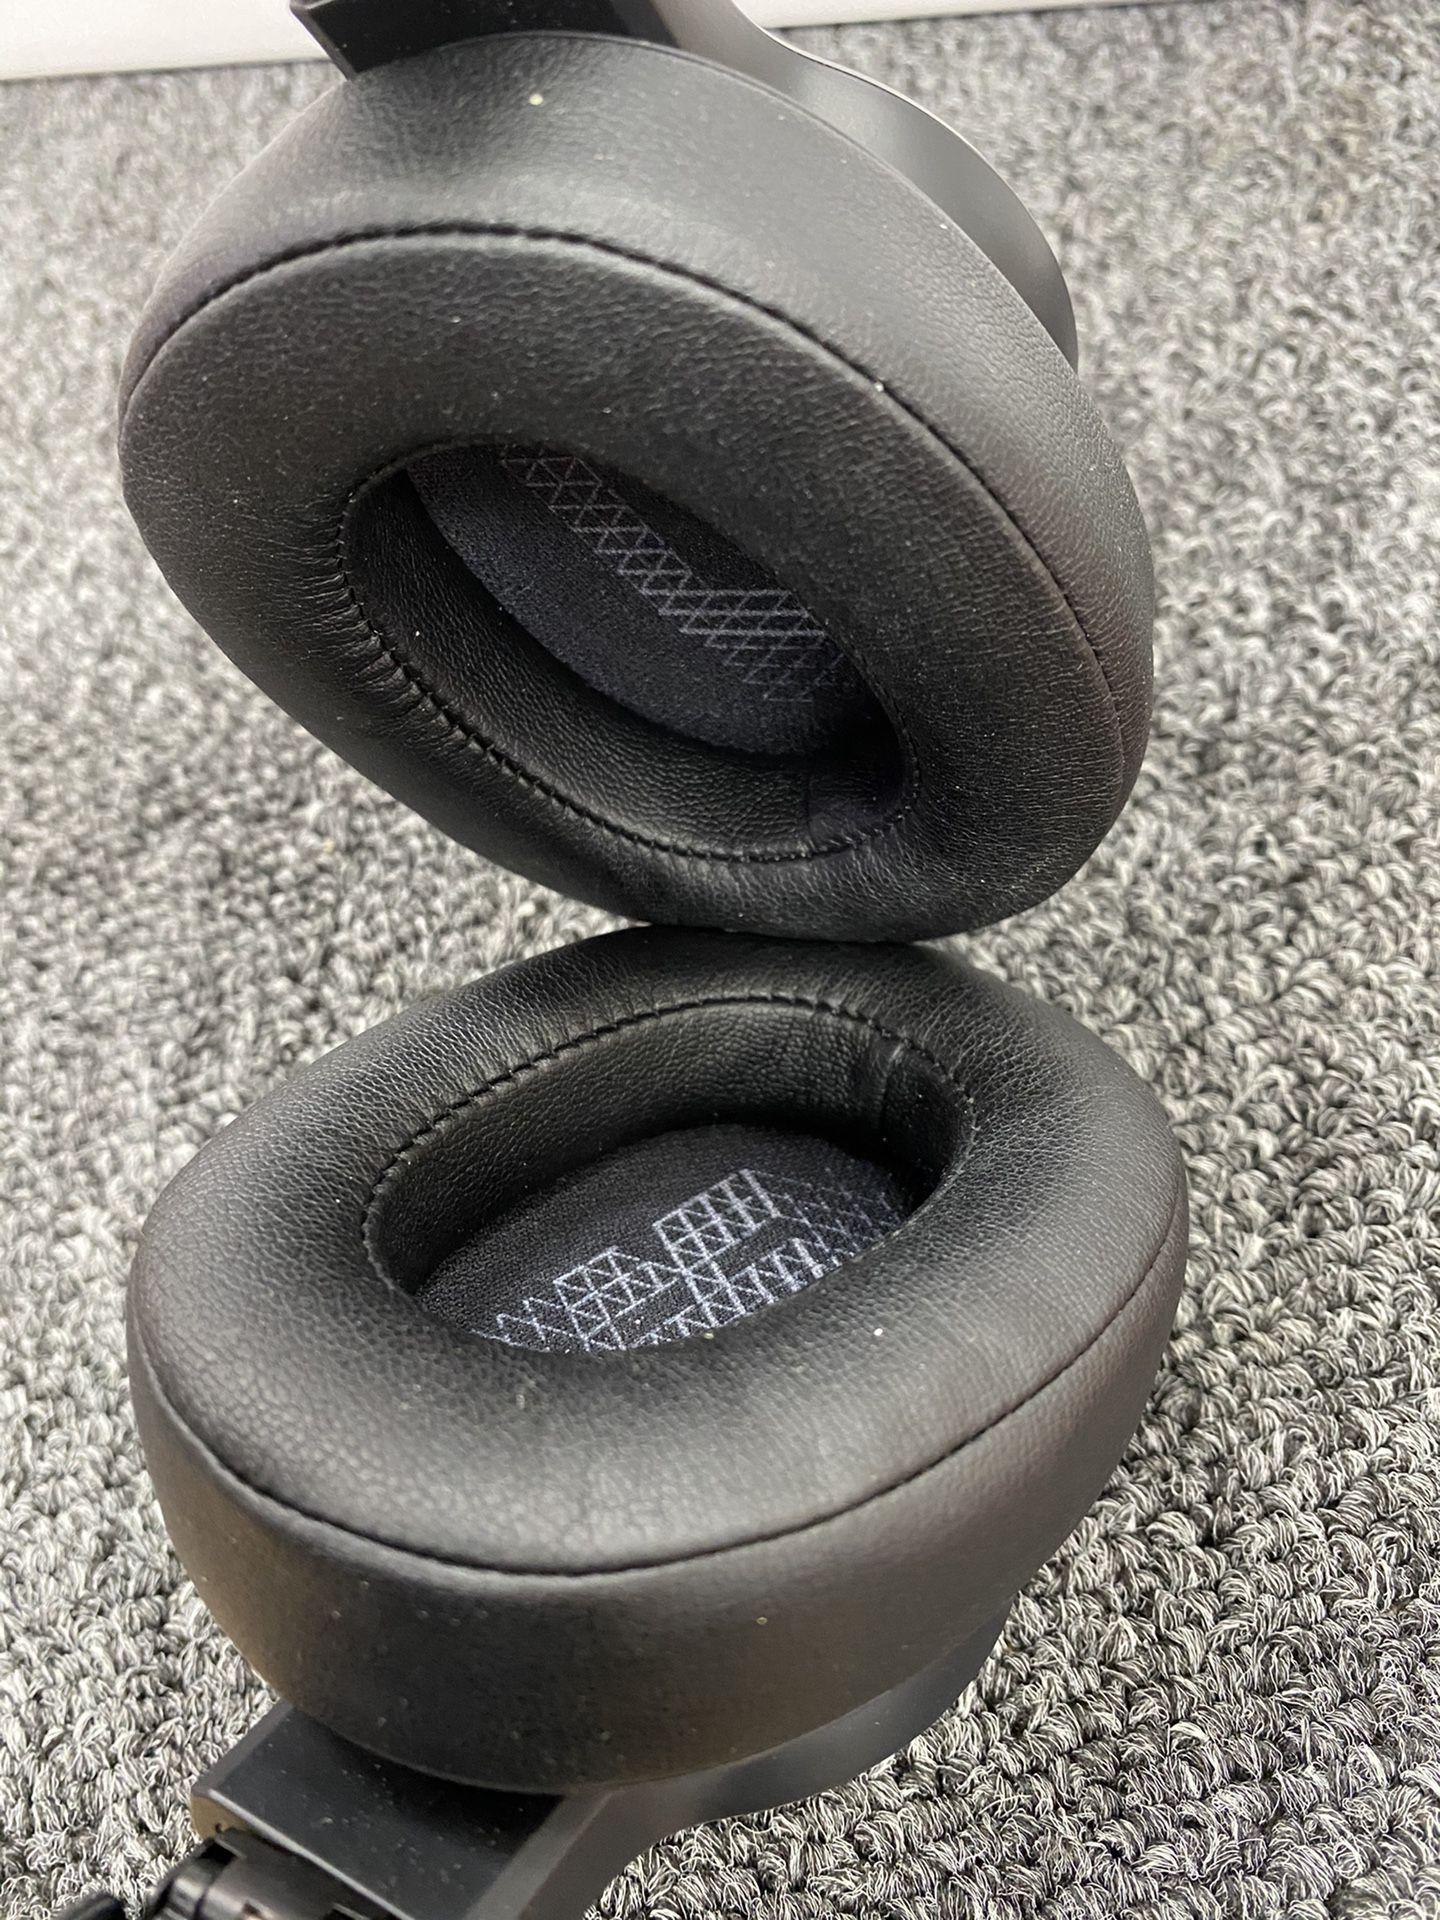 JBL LIVE 500BT Wireless Headphones